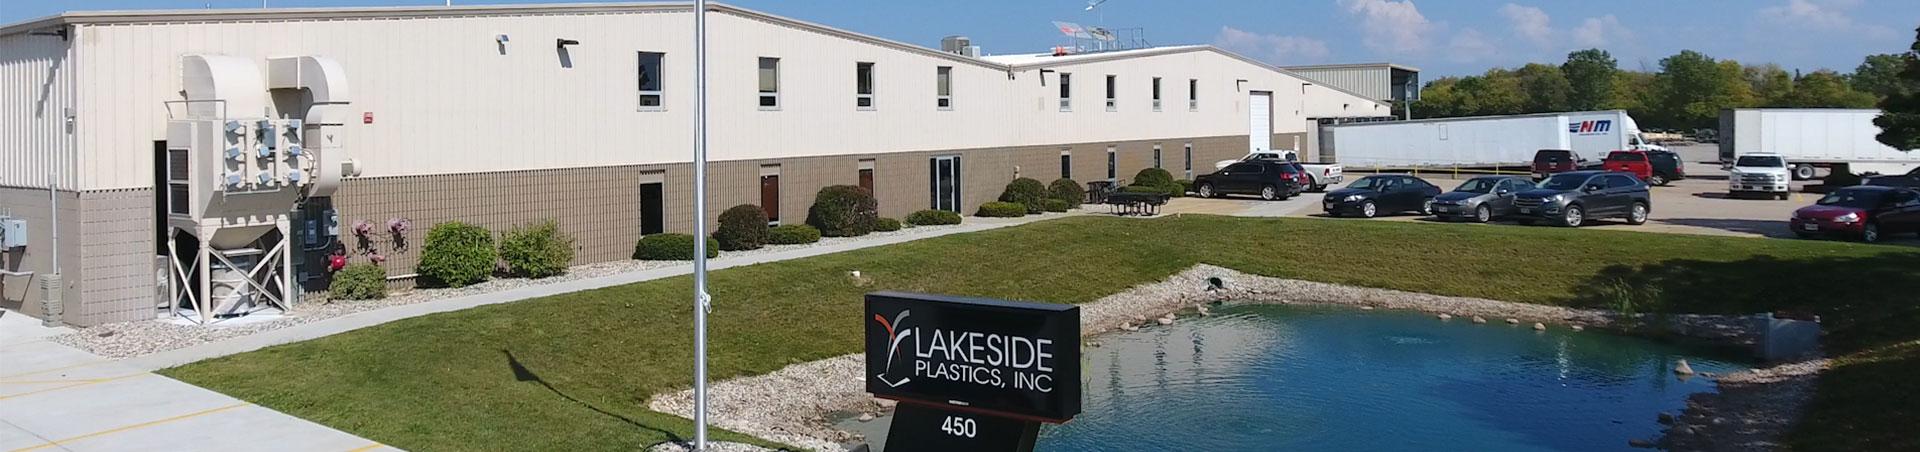 Lakeside Platics Oshkosh WI